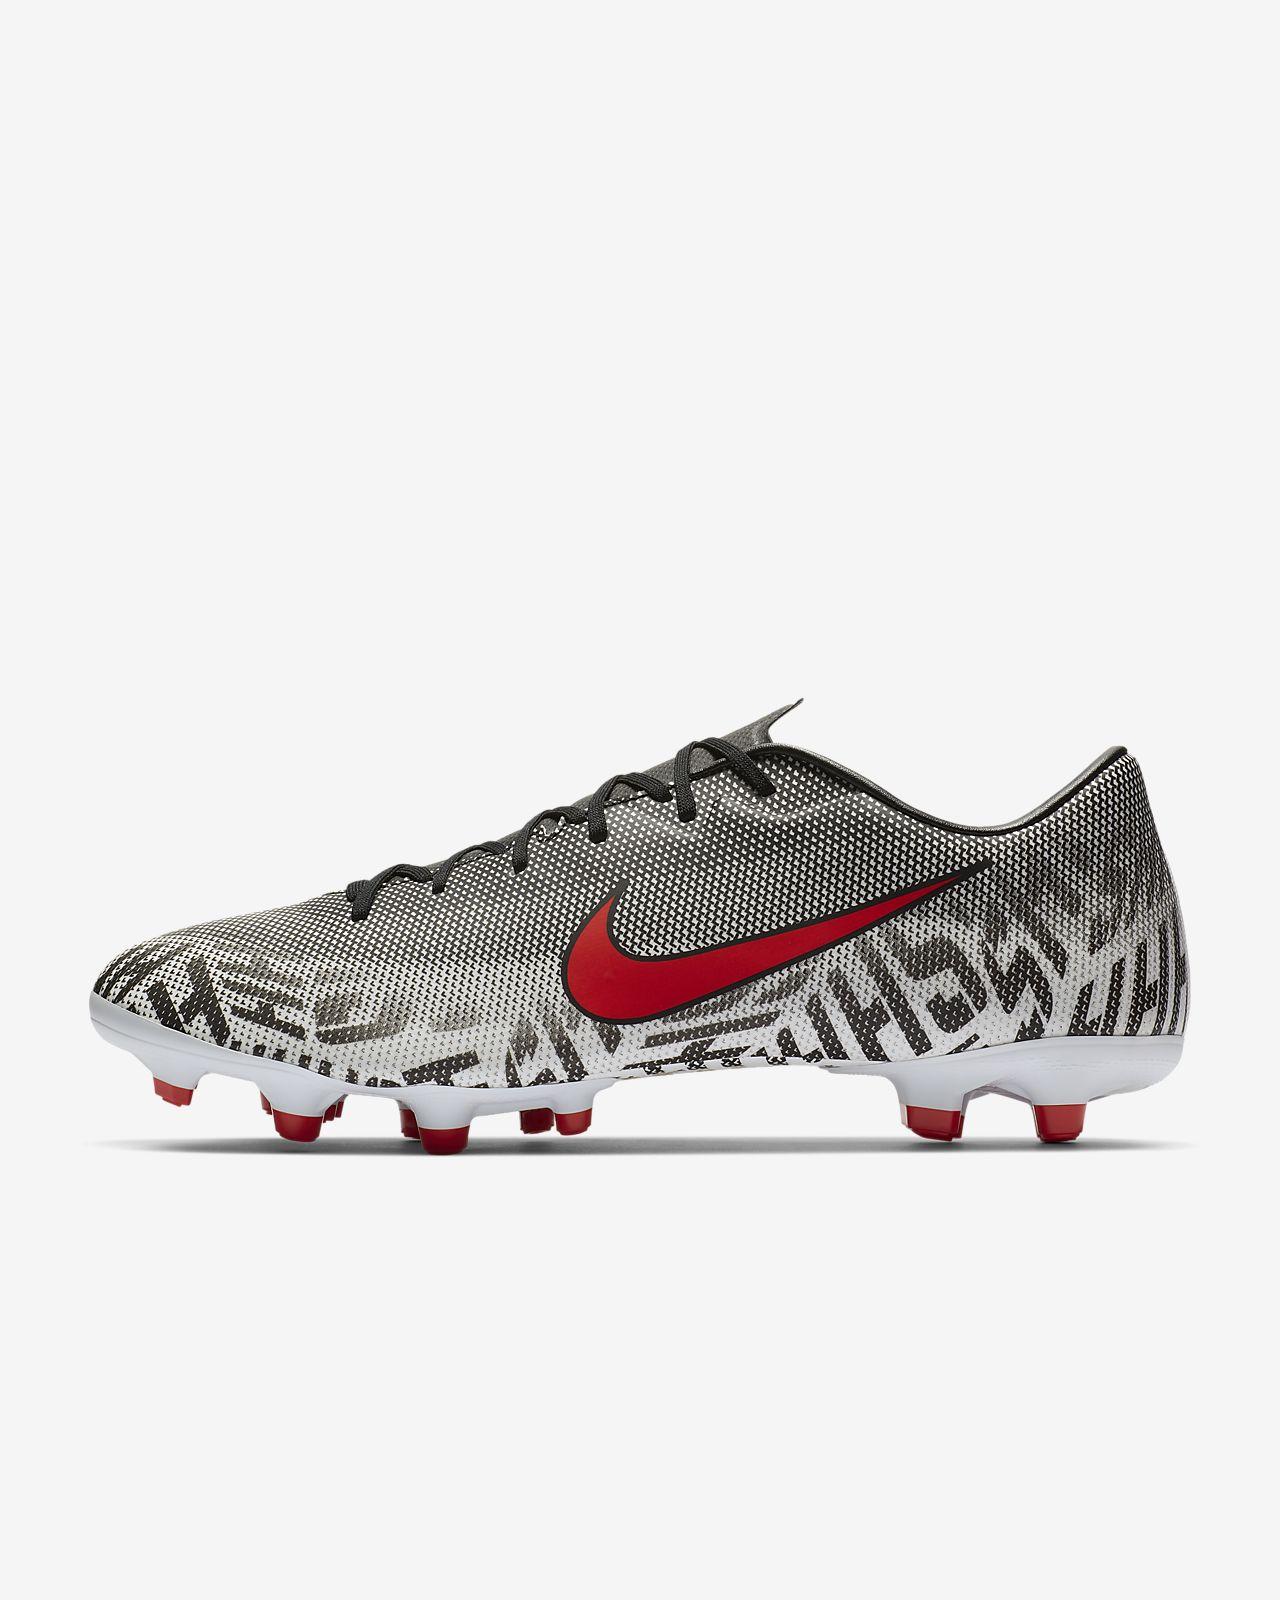 official photos 68635 1e3a3 ... Nike Mercurial Vapor XII Academy Neymar Fußballschuh für verschiedene  Böden